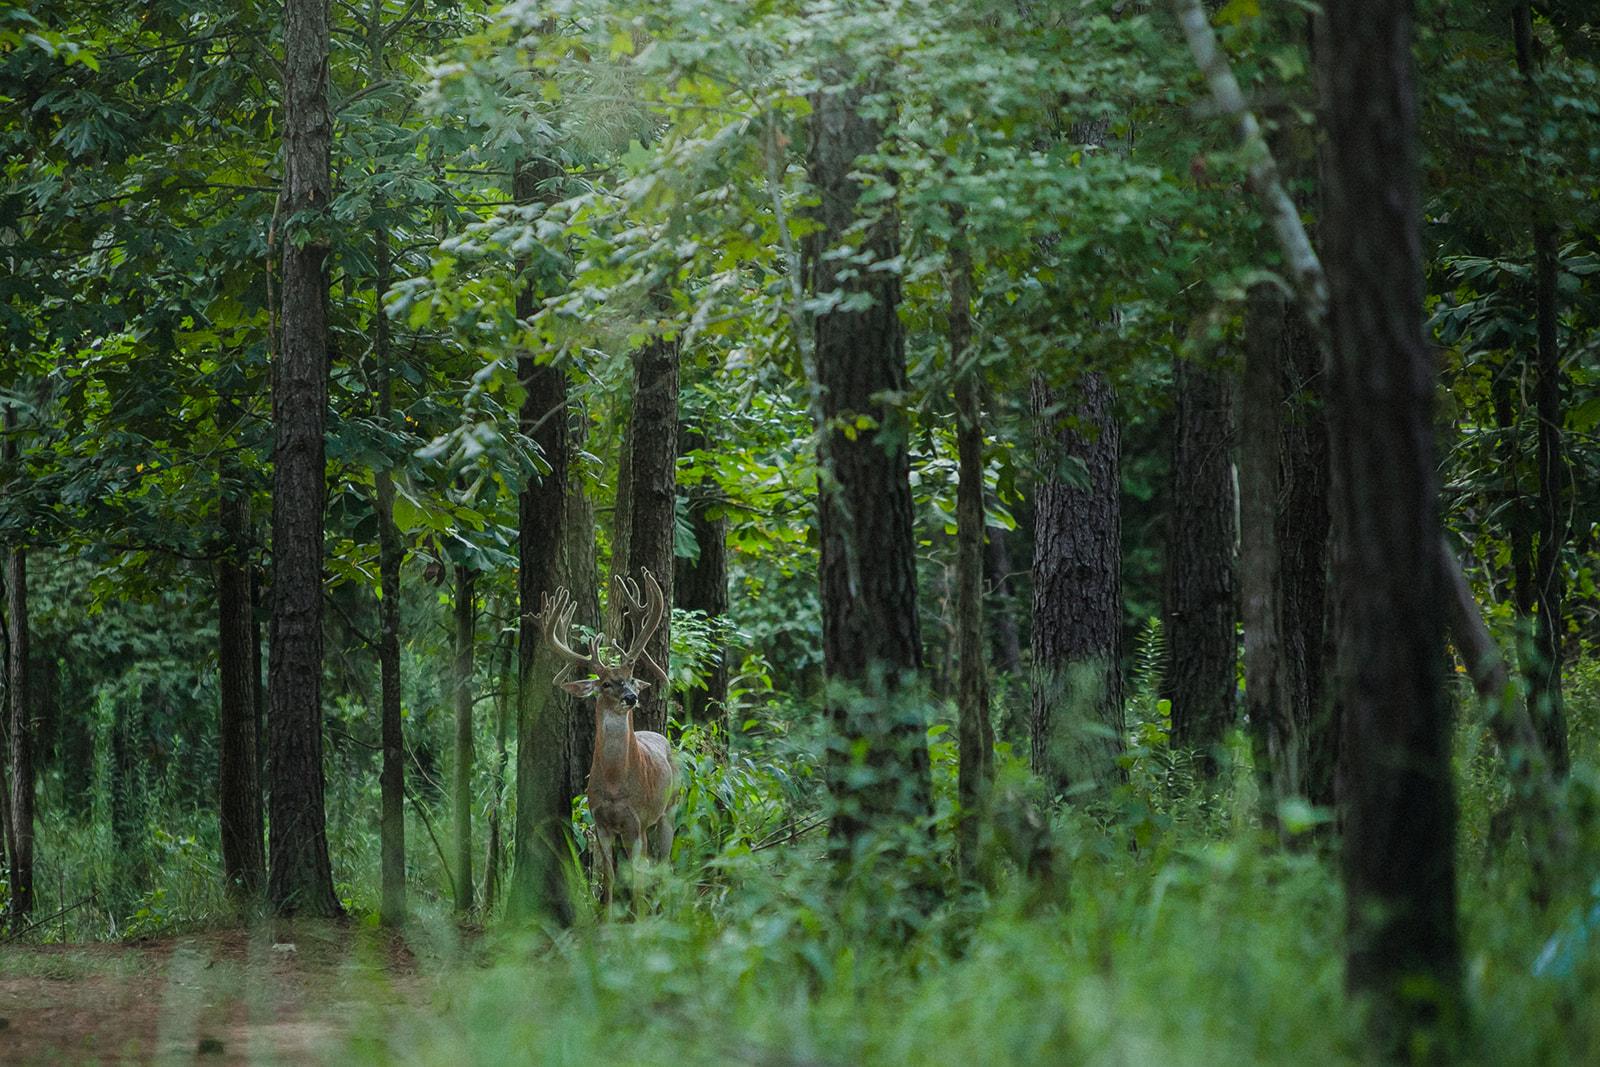 Buck Forage, Wildtree Partnership Excites Hunters